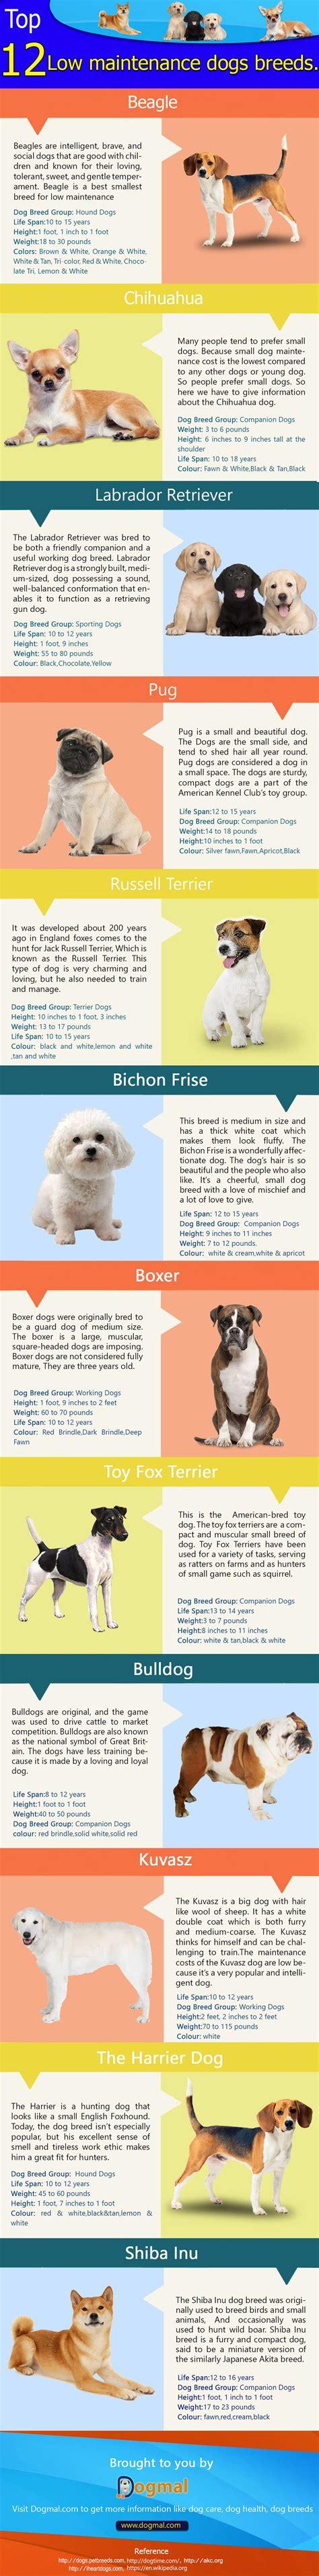 low maintenance breeds infographic 12 low maintenance breeds